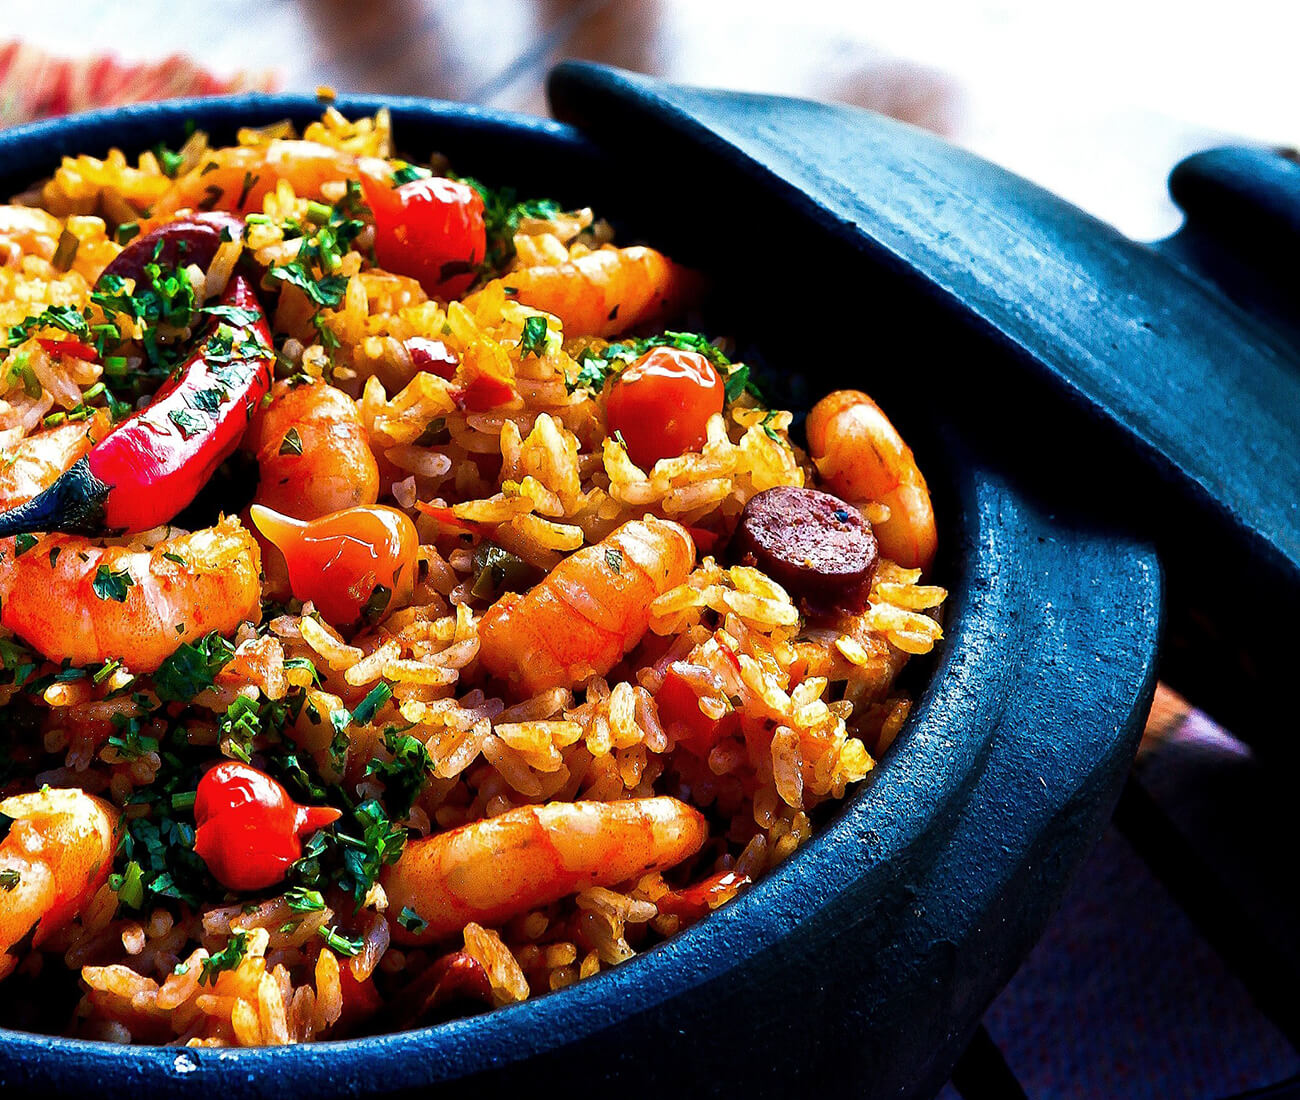 Image for Saffron Paella with Chicken, Andouille Sausage & Shrimp